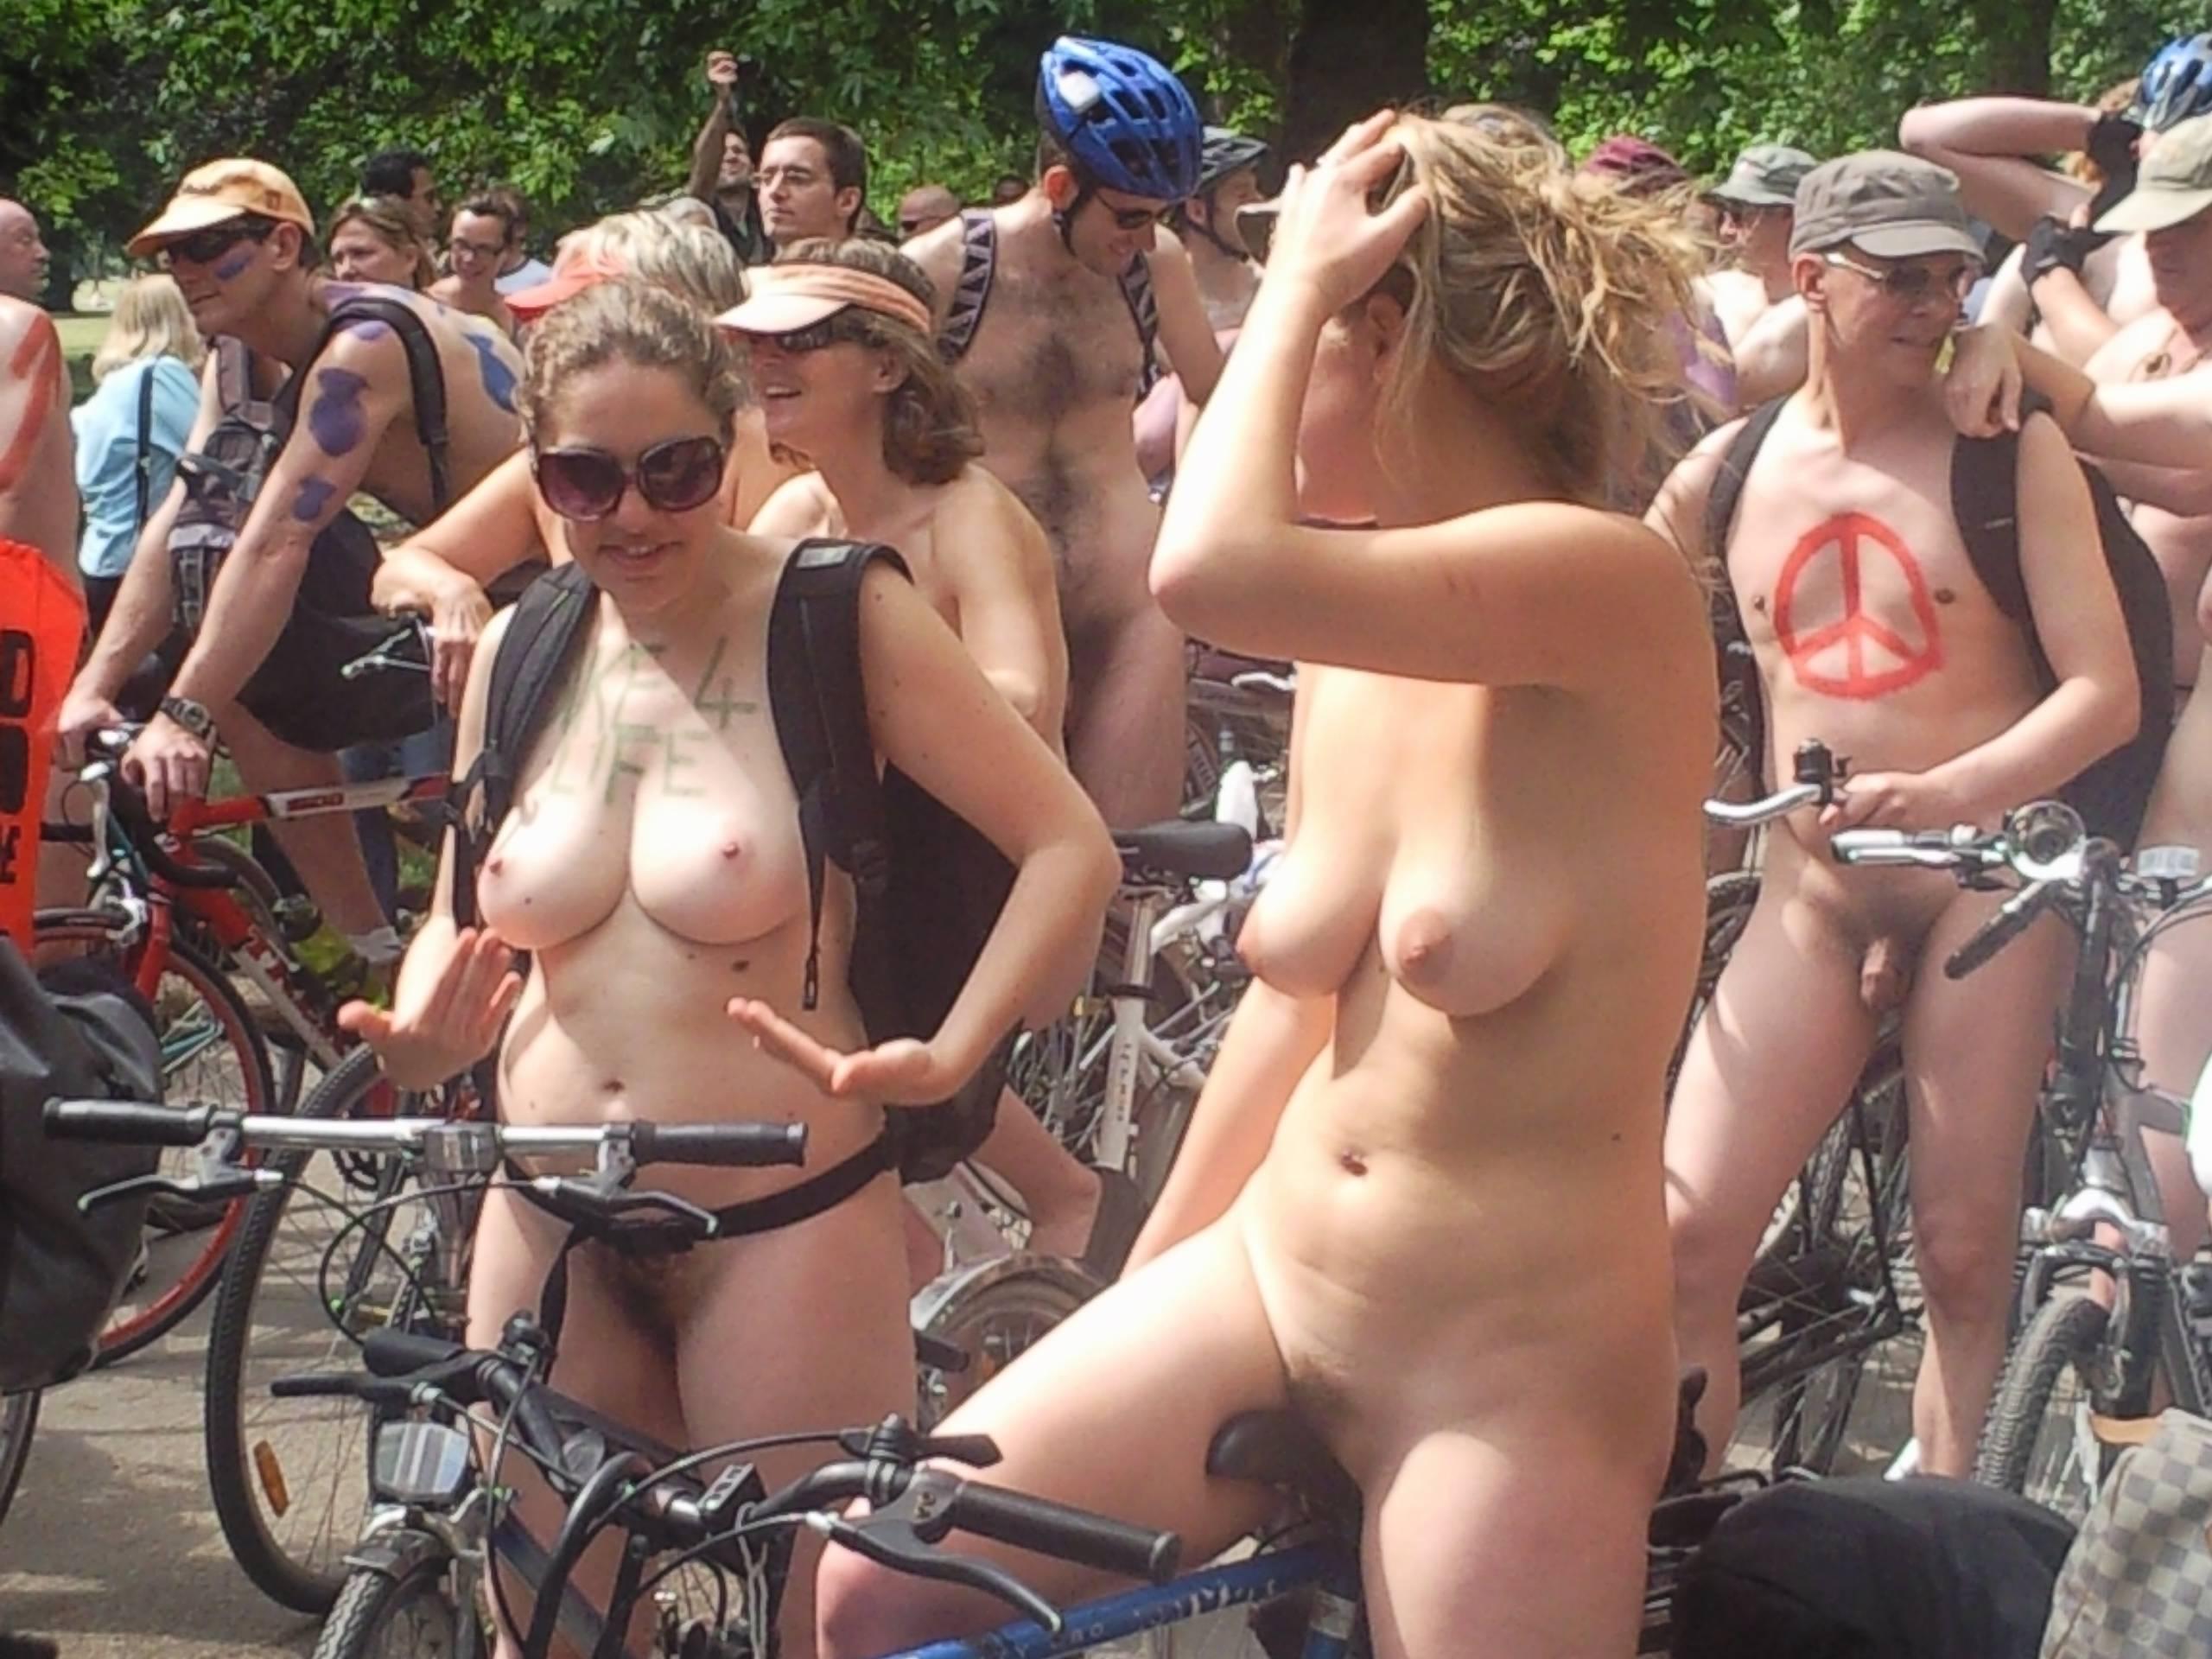 World Naked Bike Ride [WNBR] UK 2011 - 2